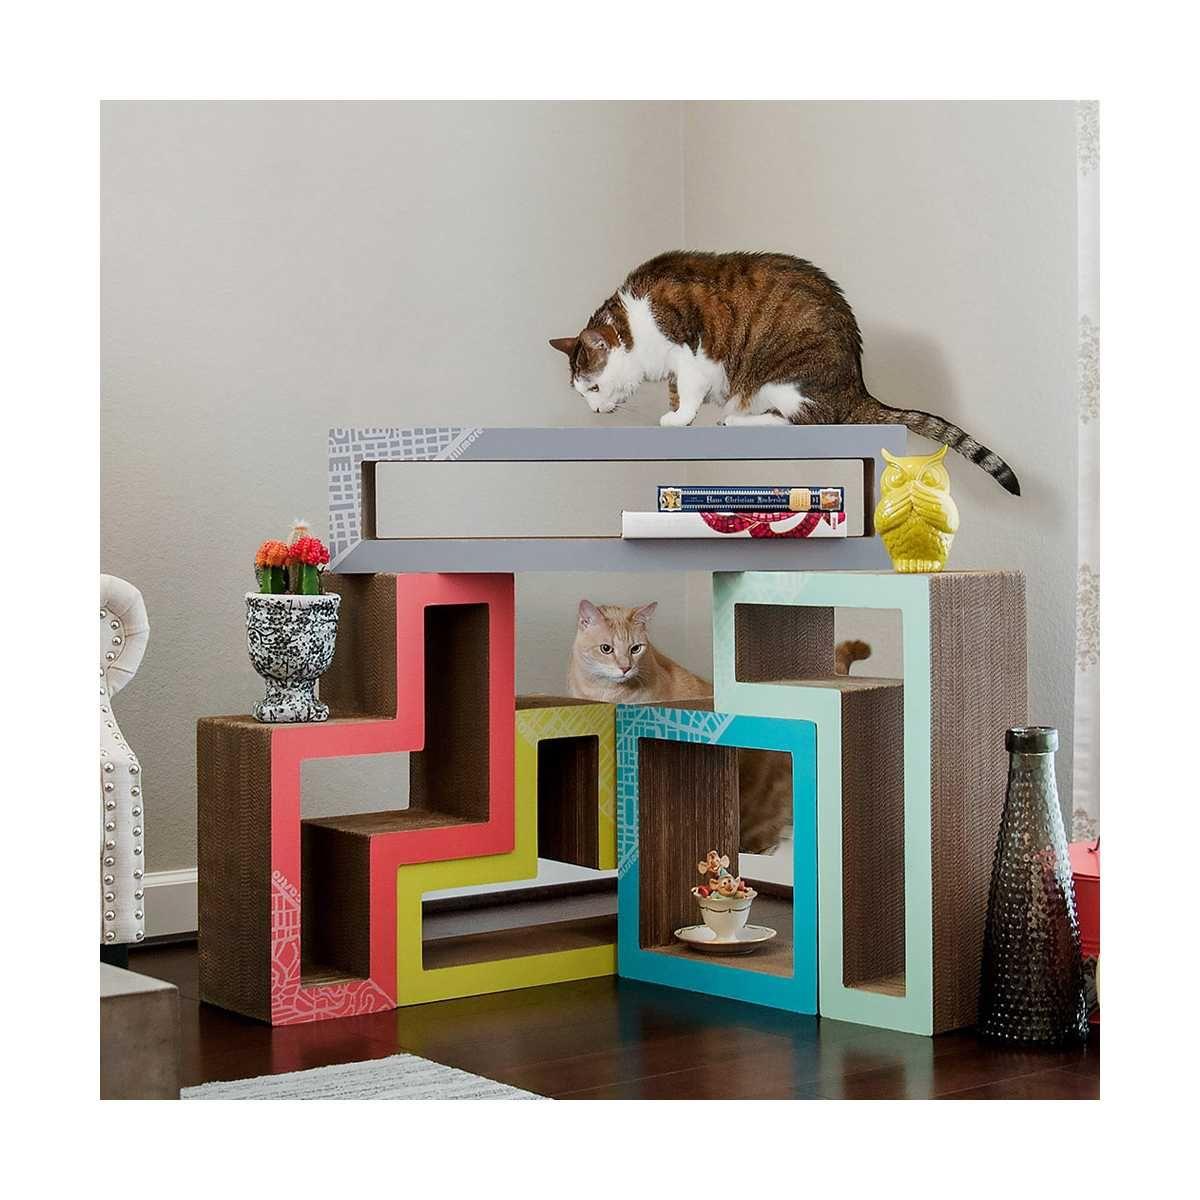 Modular Cat Tree City San Francisco Catsplay Superstore Modern Cat Furniture Modern Cat Tree Cat Tower Furniture